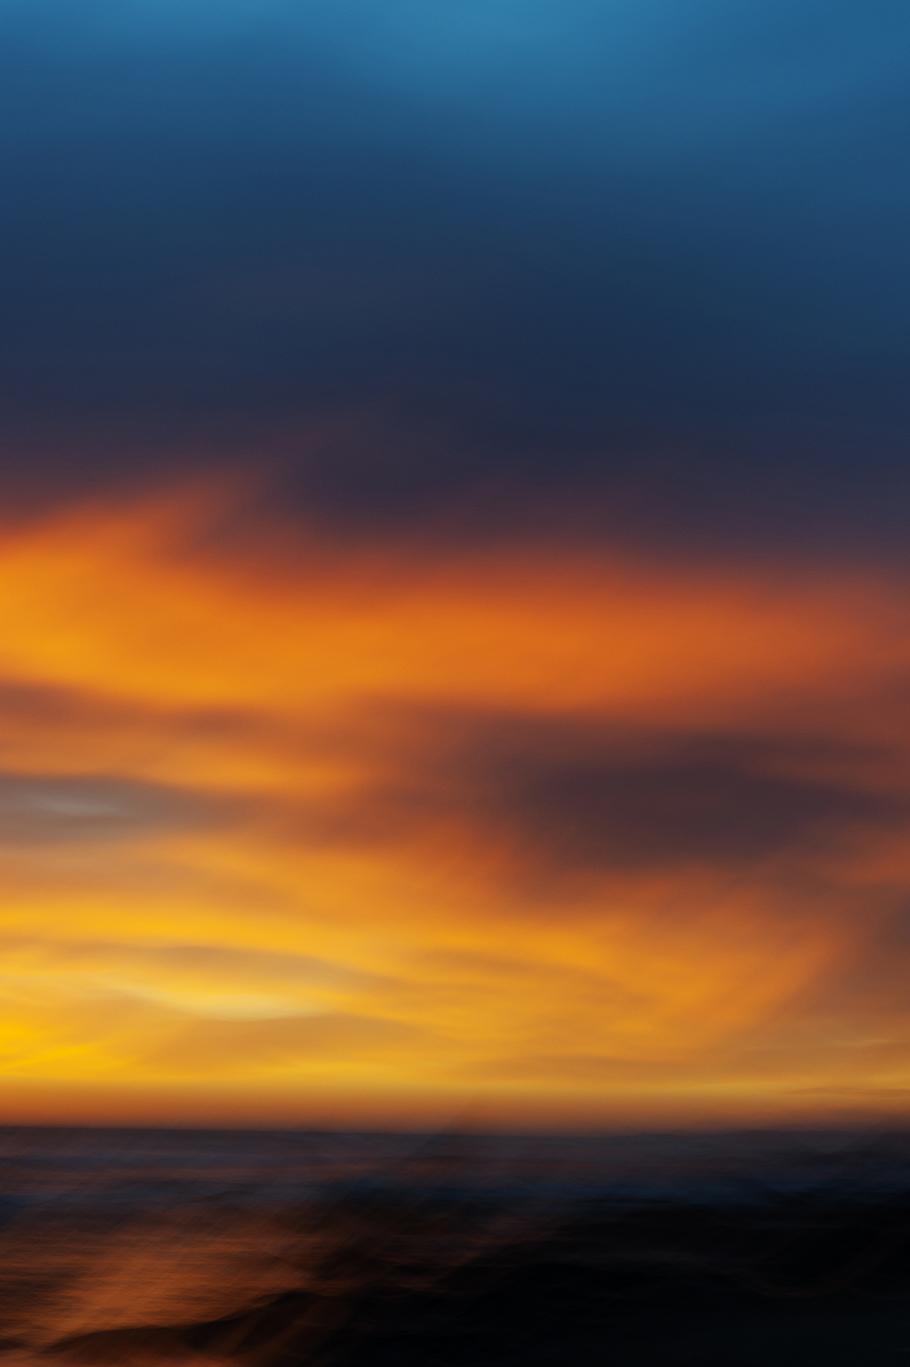 Fire in the sky. Hendry's Beach, Santa Barbara, CA.